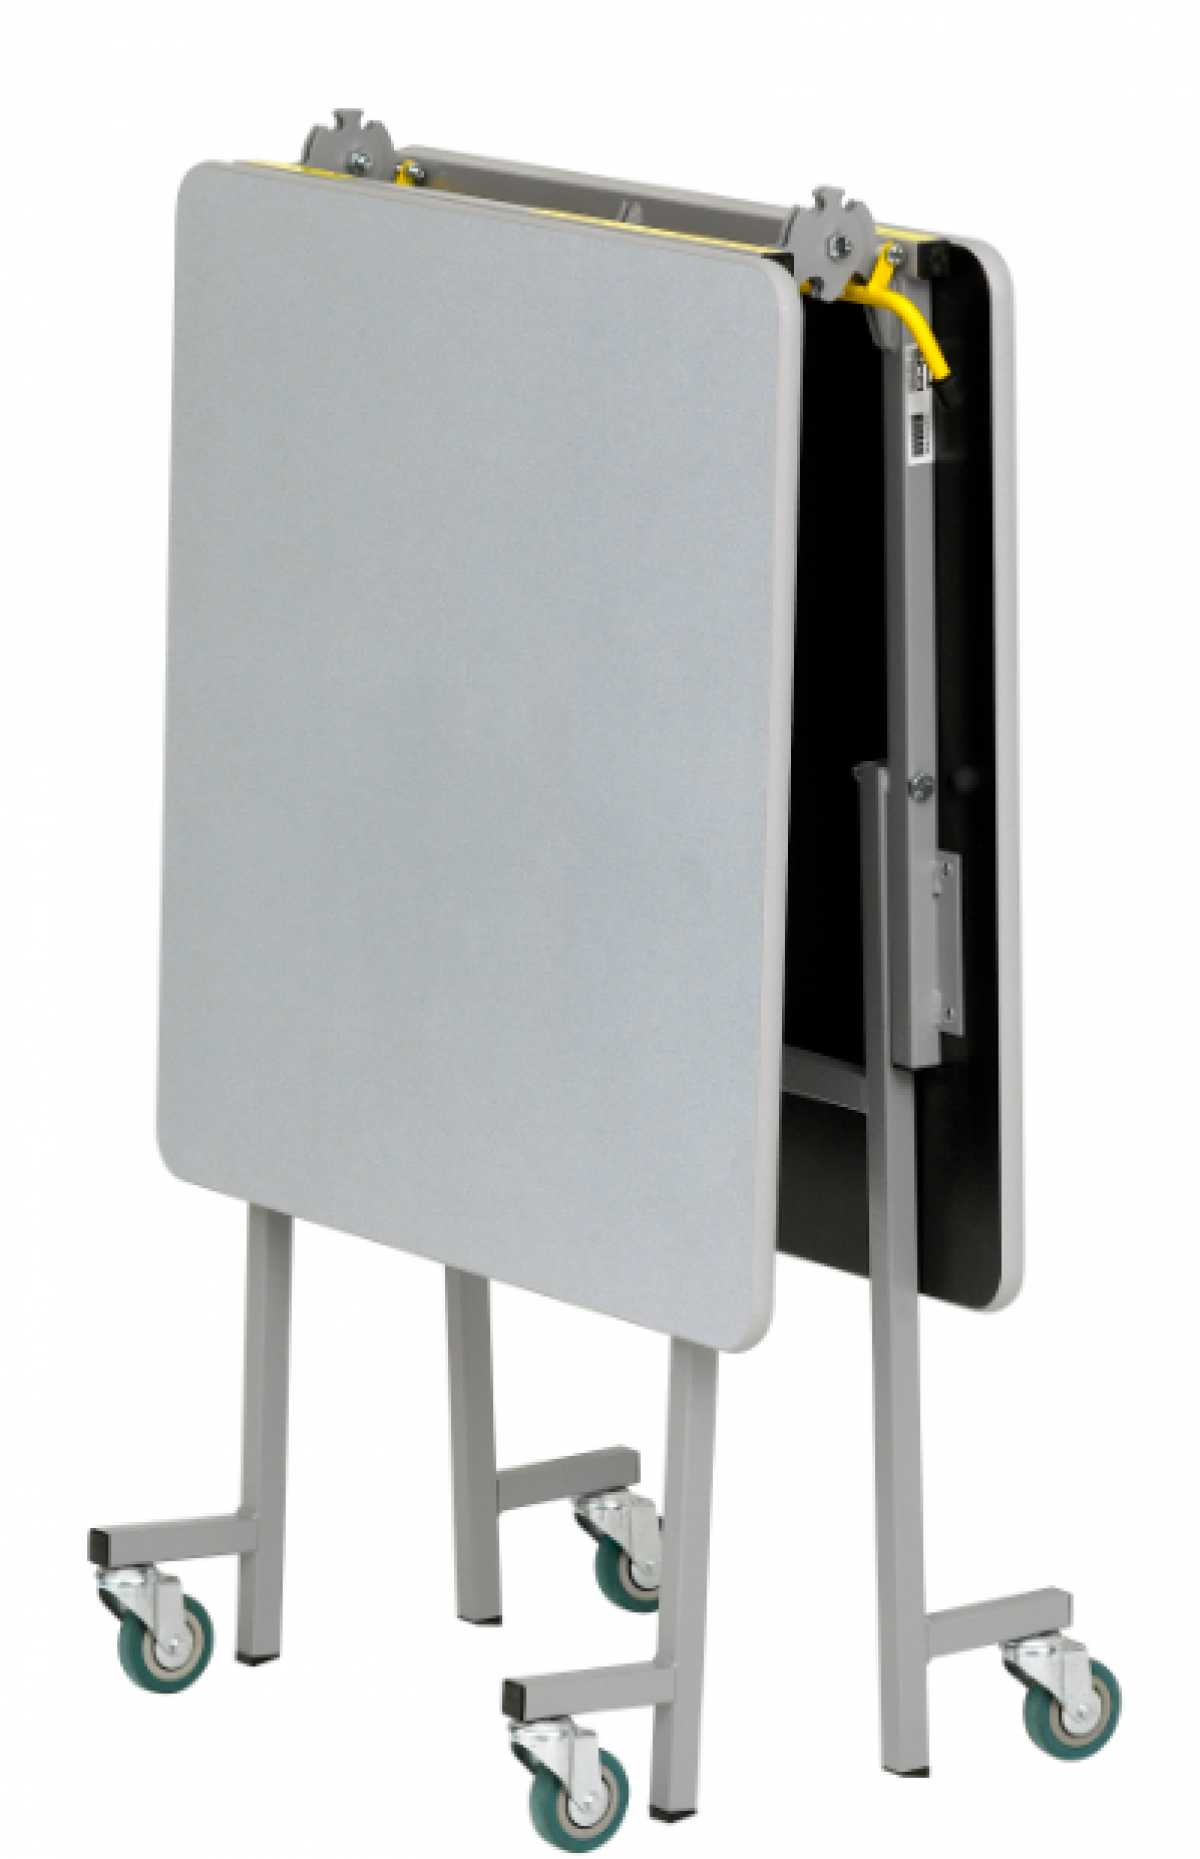 SICO Mobile & Folding Table